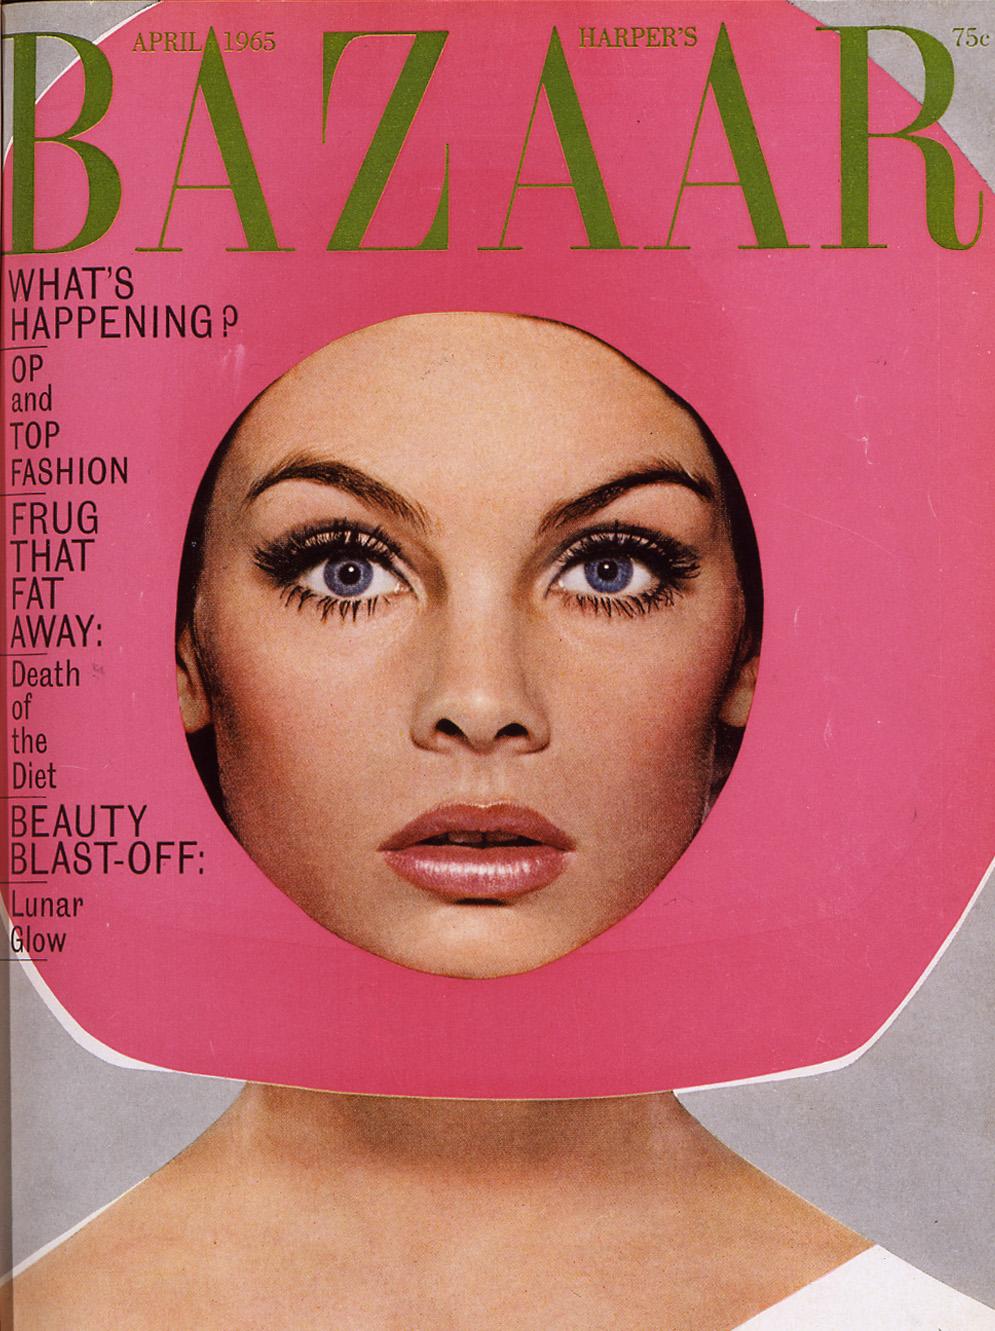 Richard Avedon Harpers Bazaar